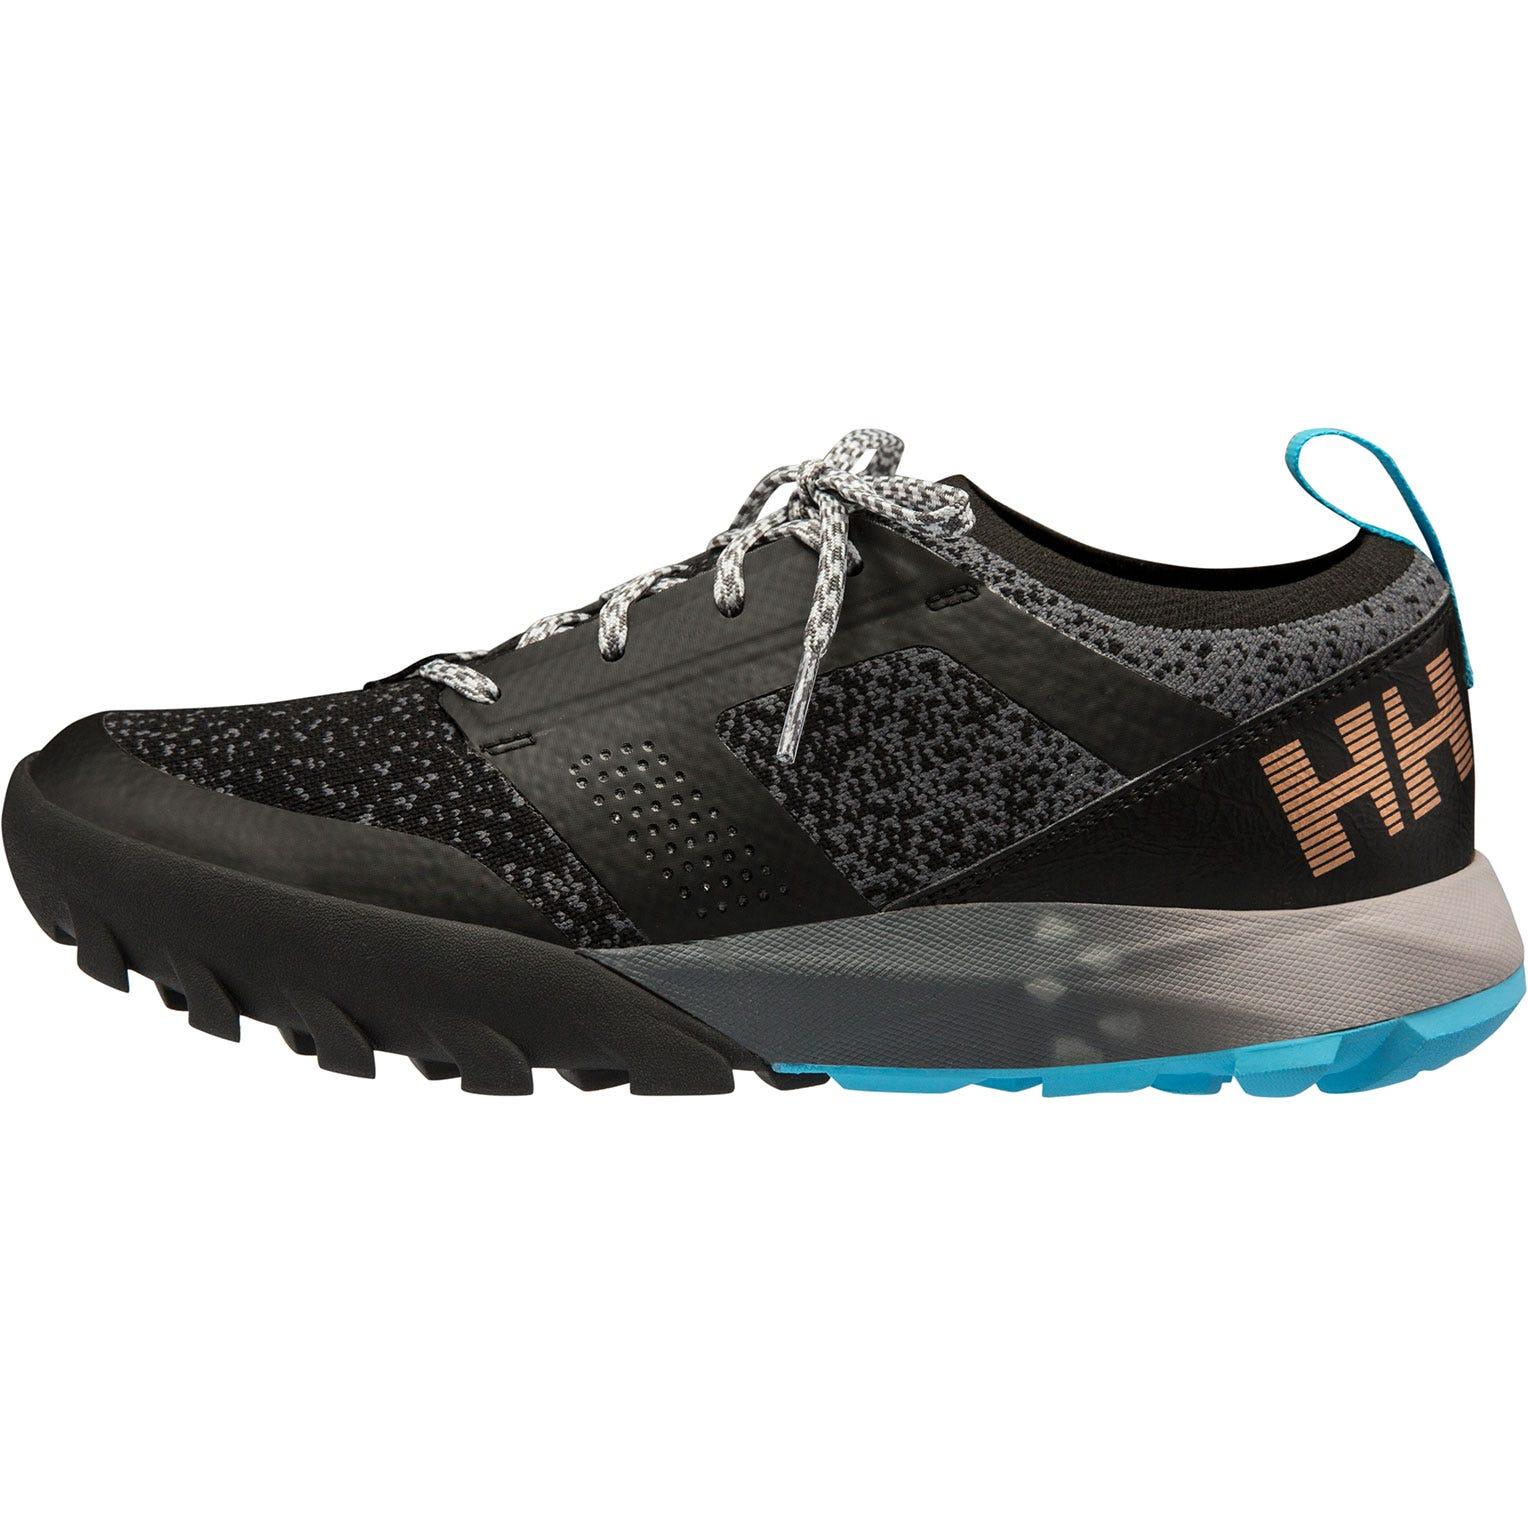 Helly Hansen W Loke Dash Womens Hiking Boot Black 36/5.5